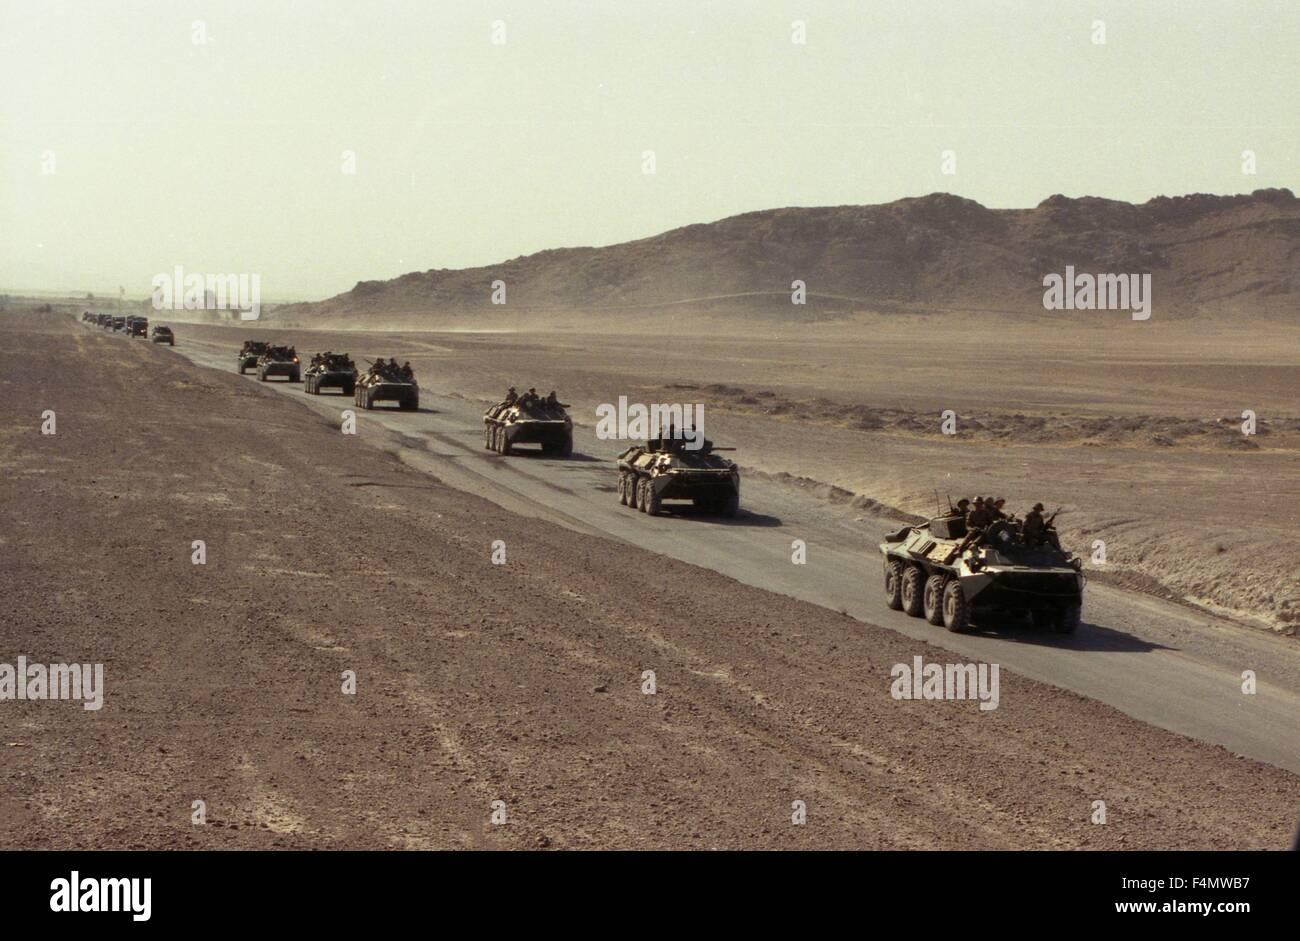 Soviet Afghanistan war - Page 6 Afghanistan-the-soviet-military-technics-on-road-to-kandahar-F4MWB7